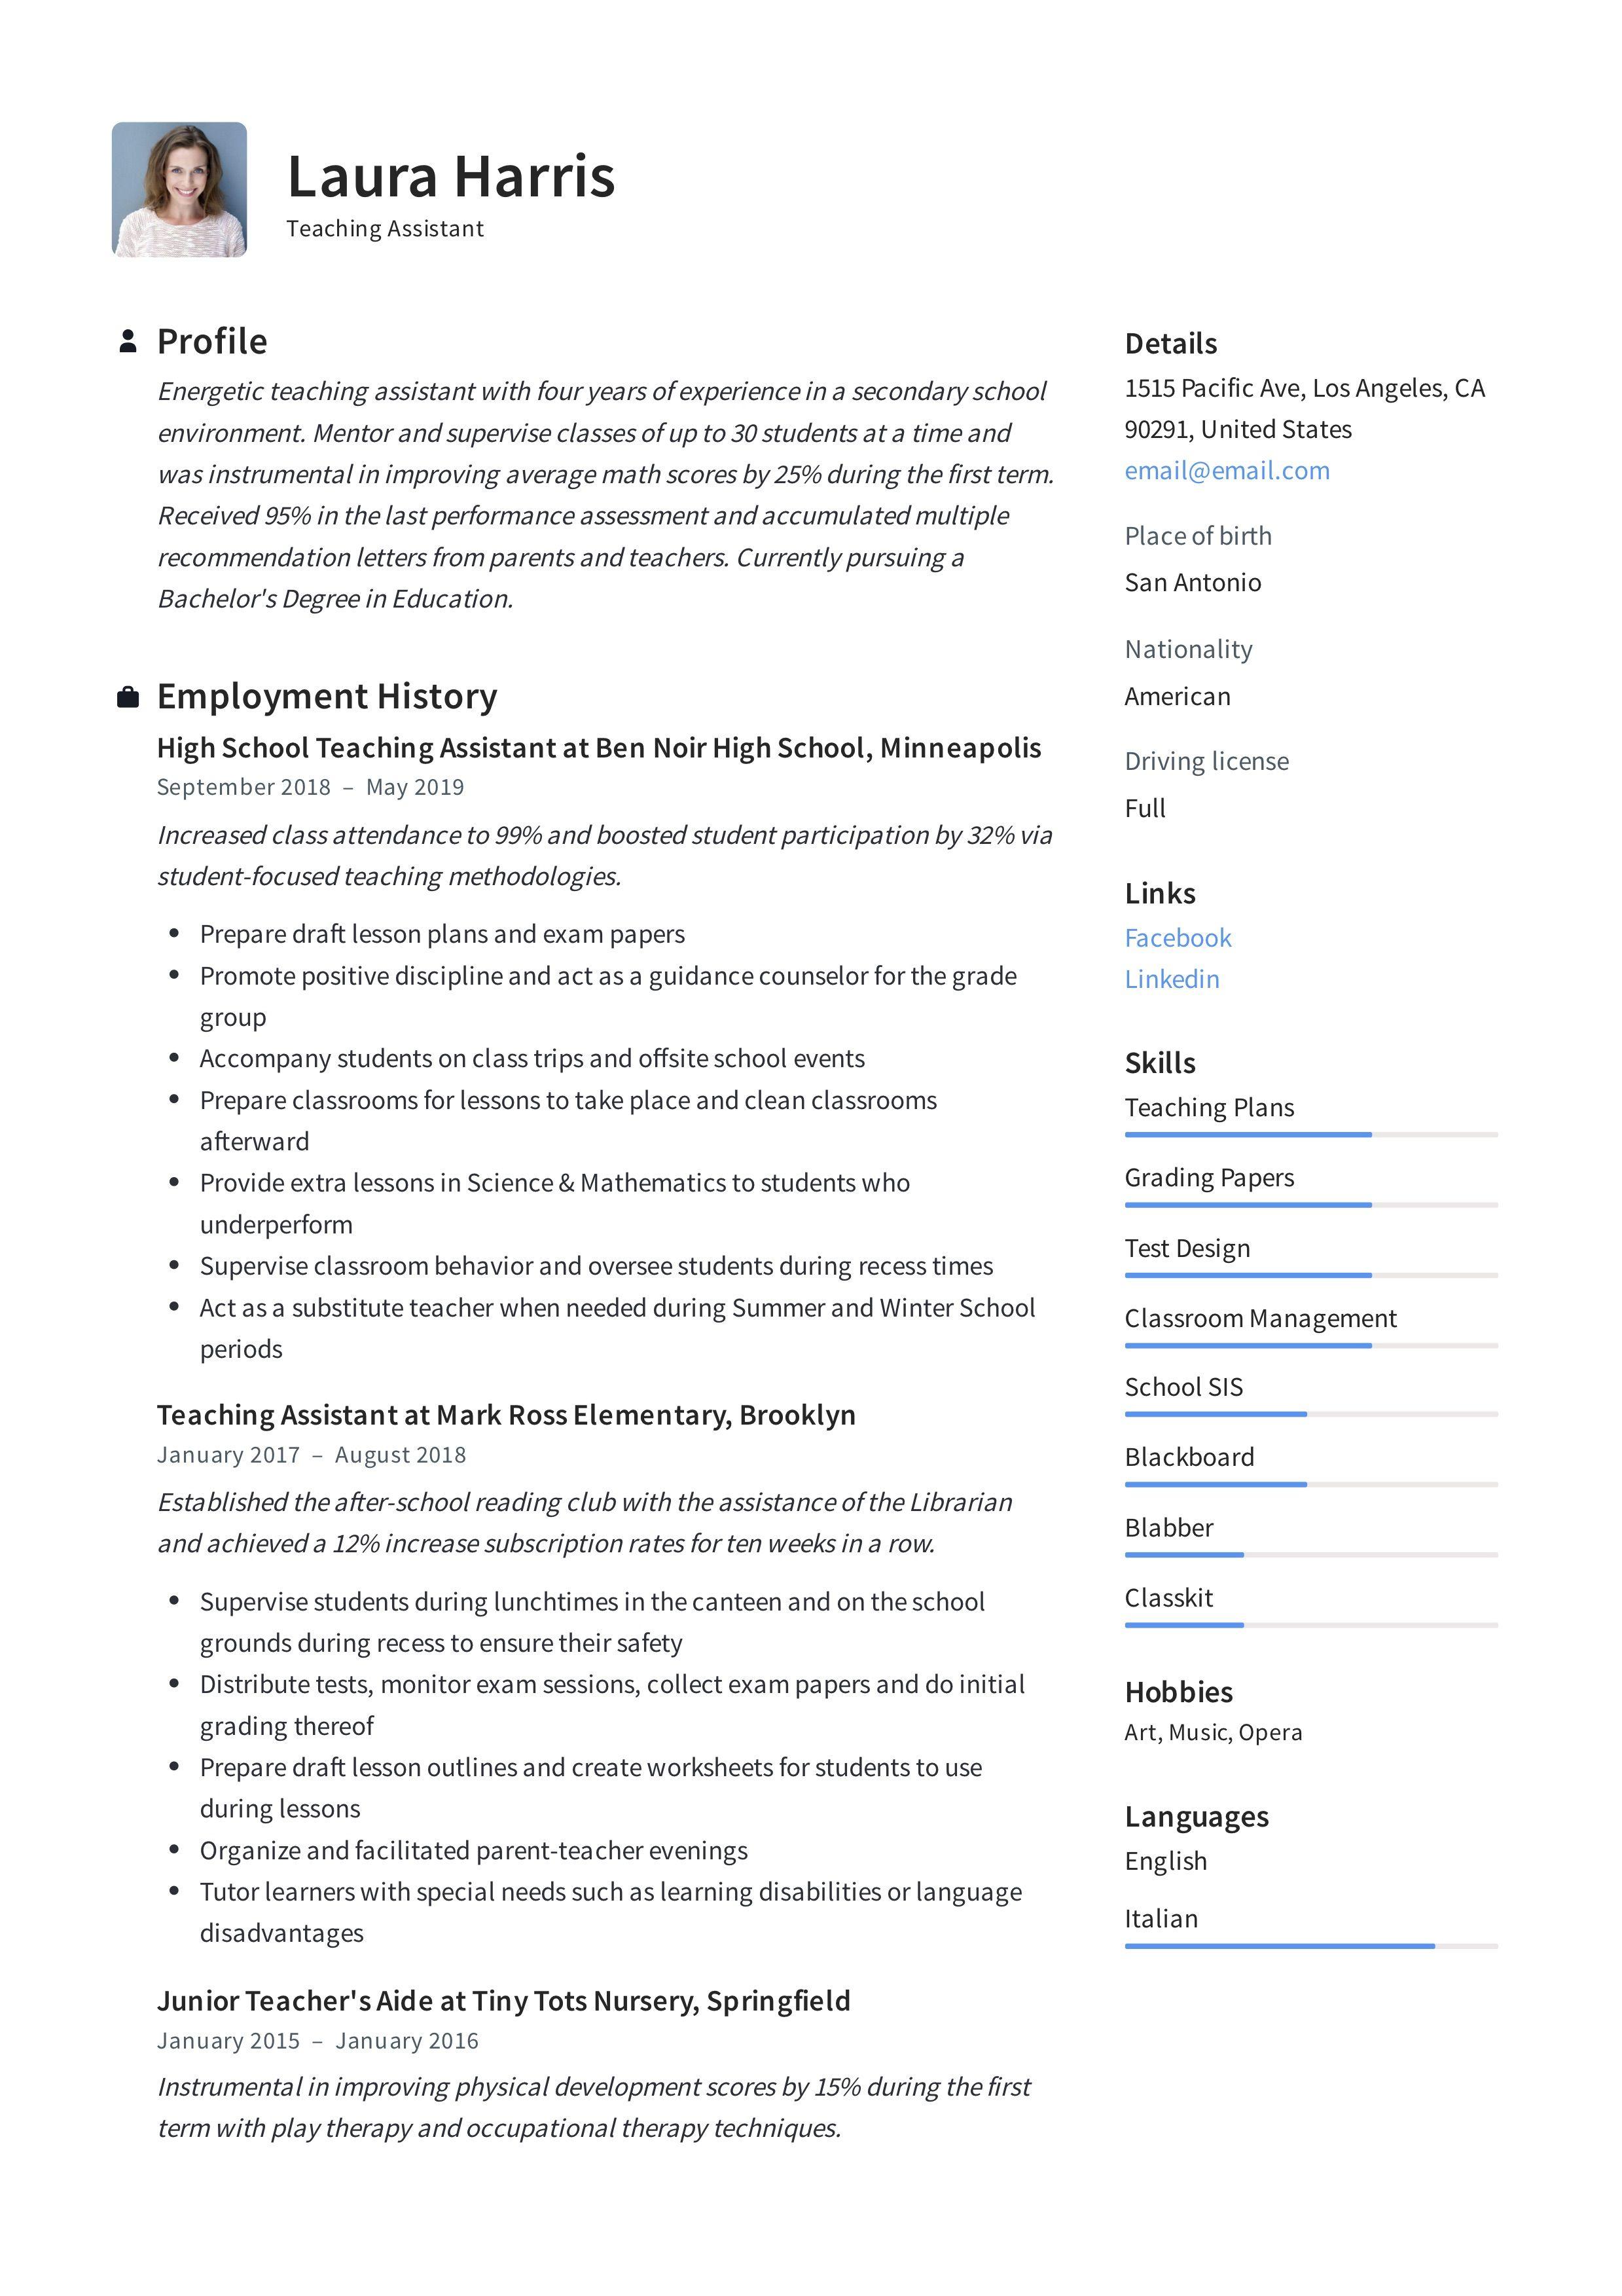 Teaching Assistant Resume Template Teacher Assistant Jobs Teaching Assistant Teaching College